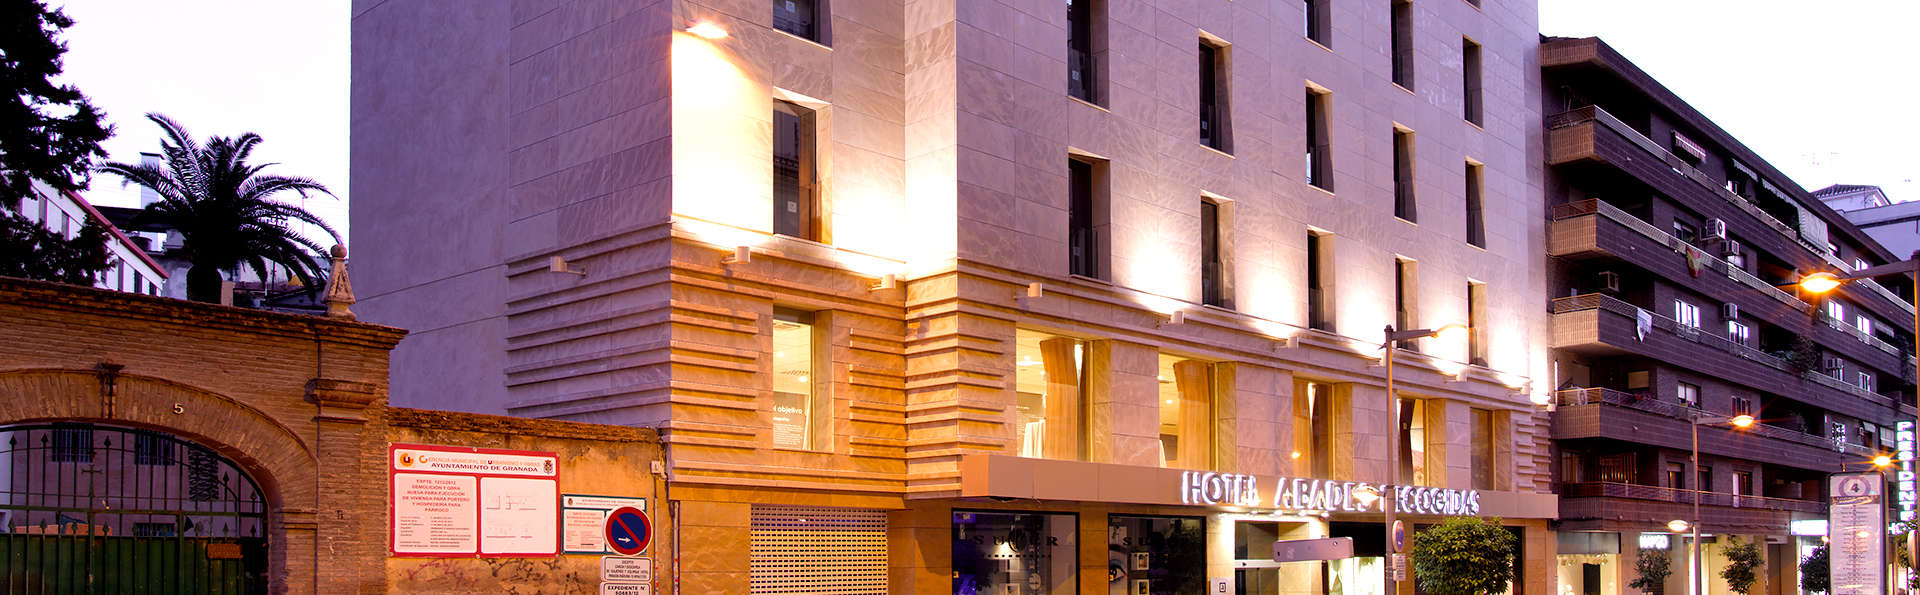 Hotel Abades Recogidas - Edit_Front2.jpg